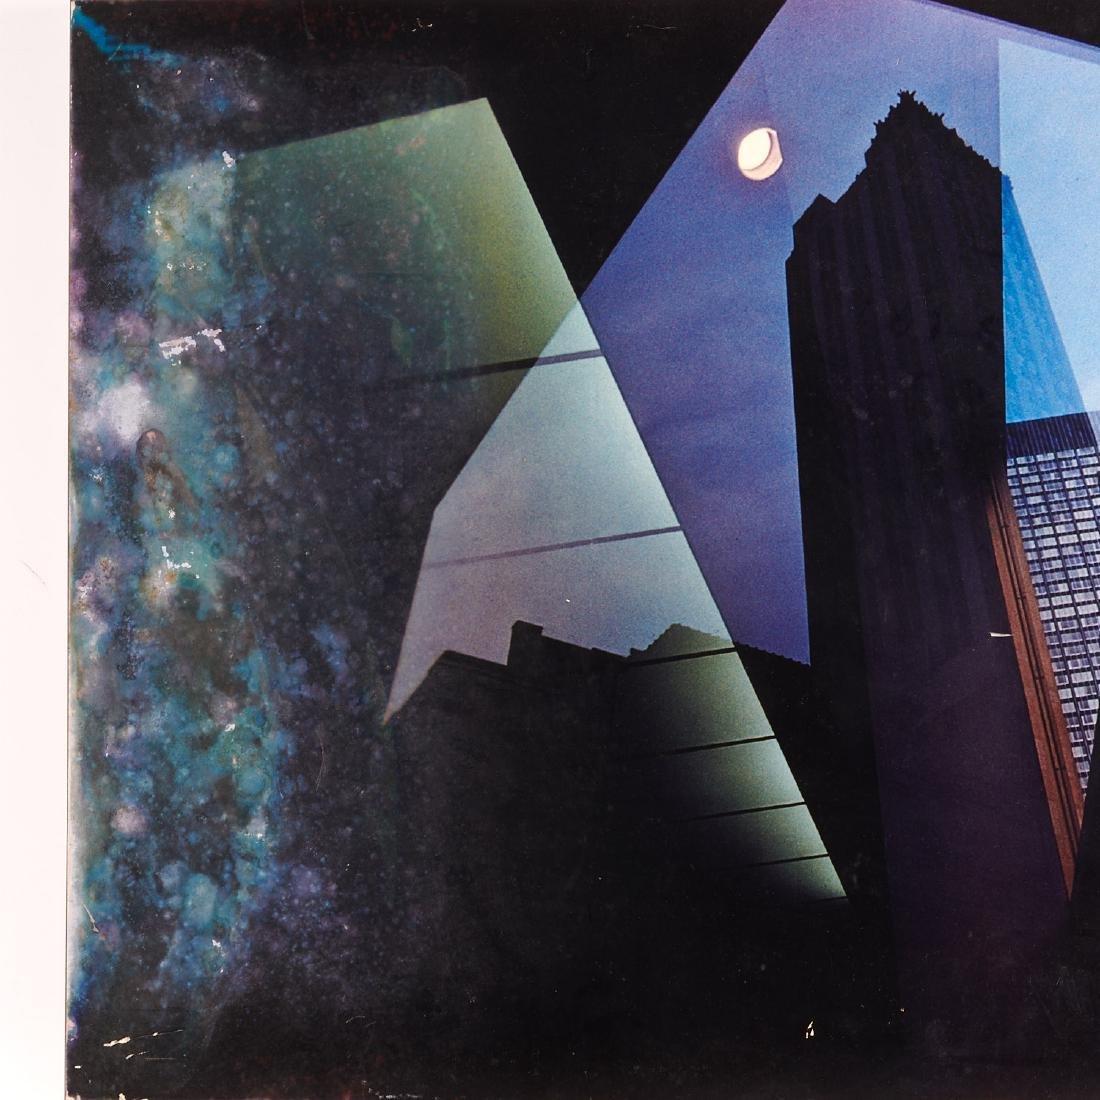 Ernst Haas, (2) Photographs, 1969 - 6